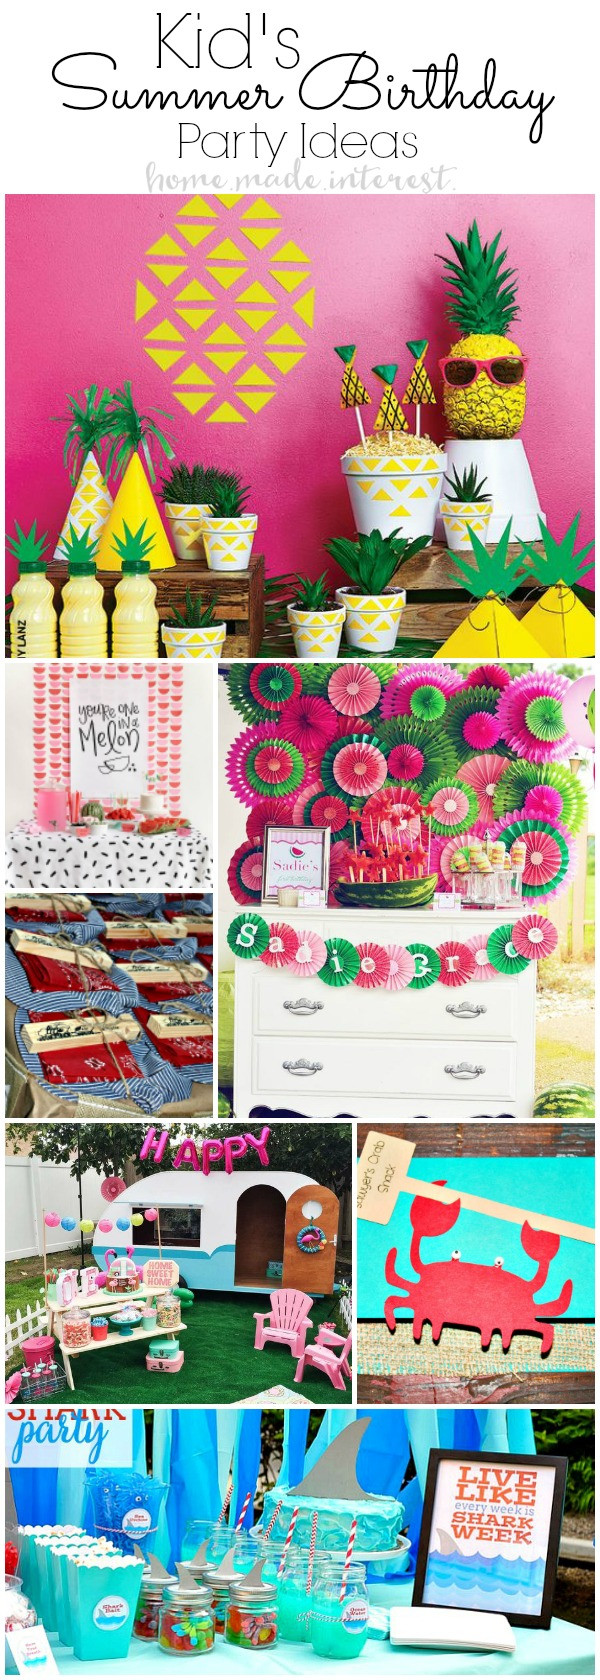 Summer Birthday Party Ideas For Boys  Summer Birthday Party Ideas for Kids Home Made Interest